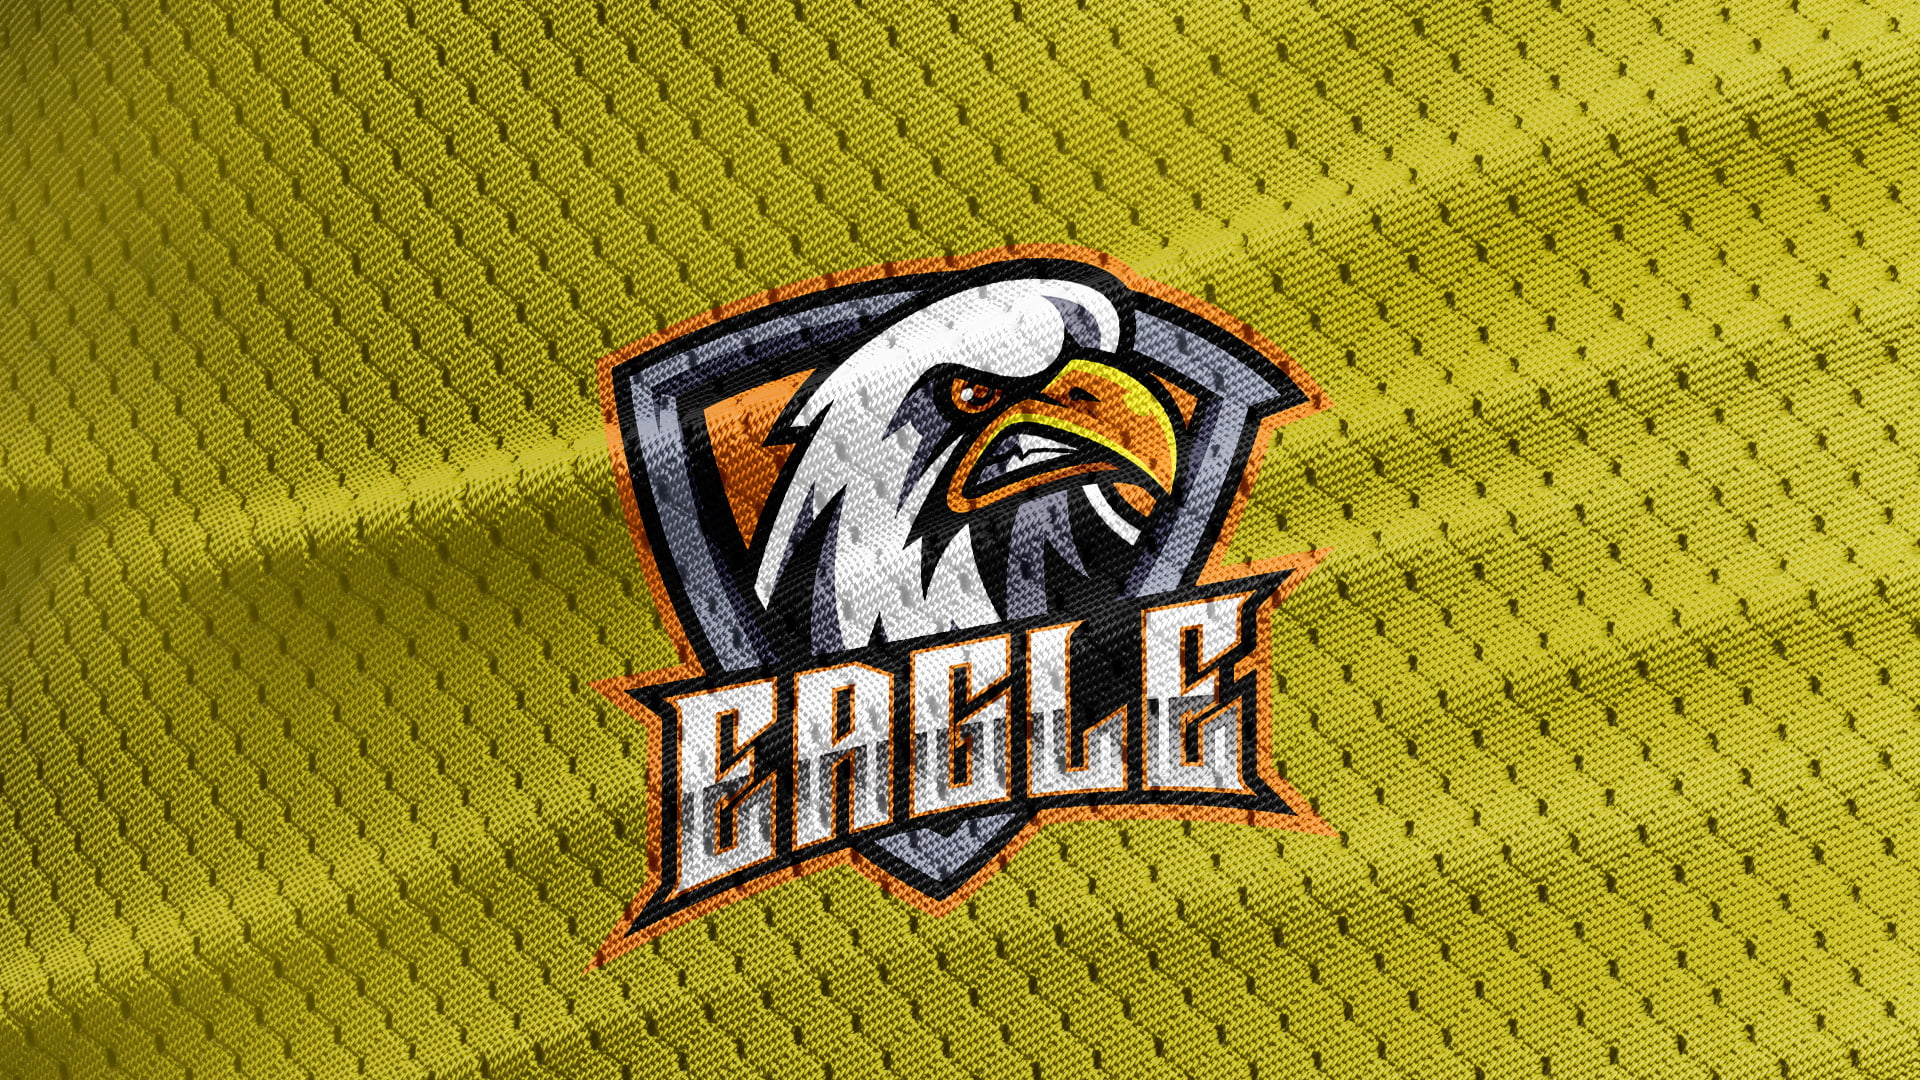 Yellow-Jersey-Texture-Free-Eagle-Logo-Mascot